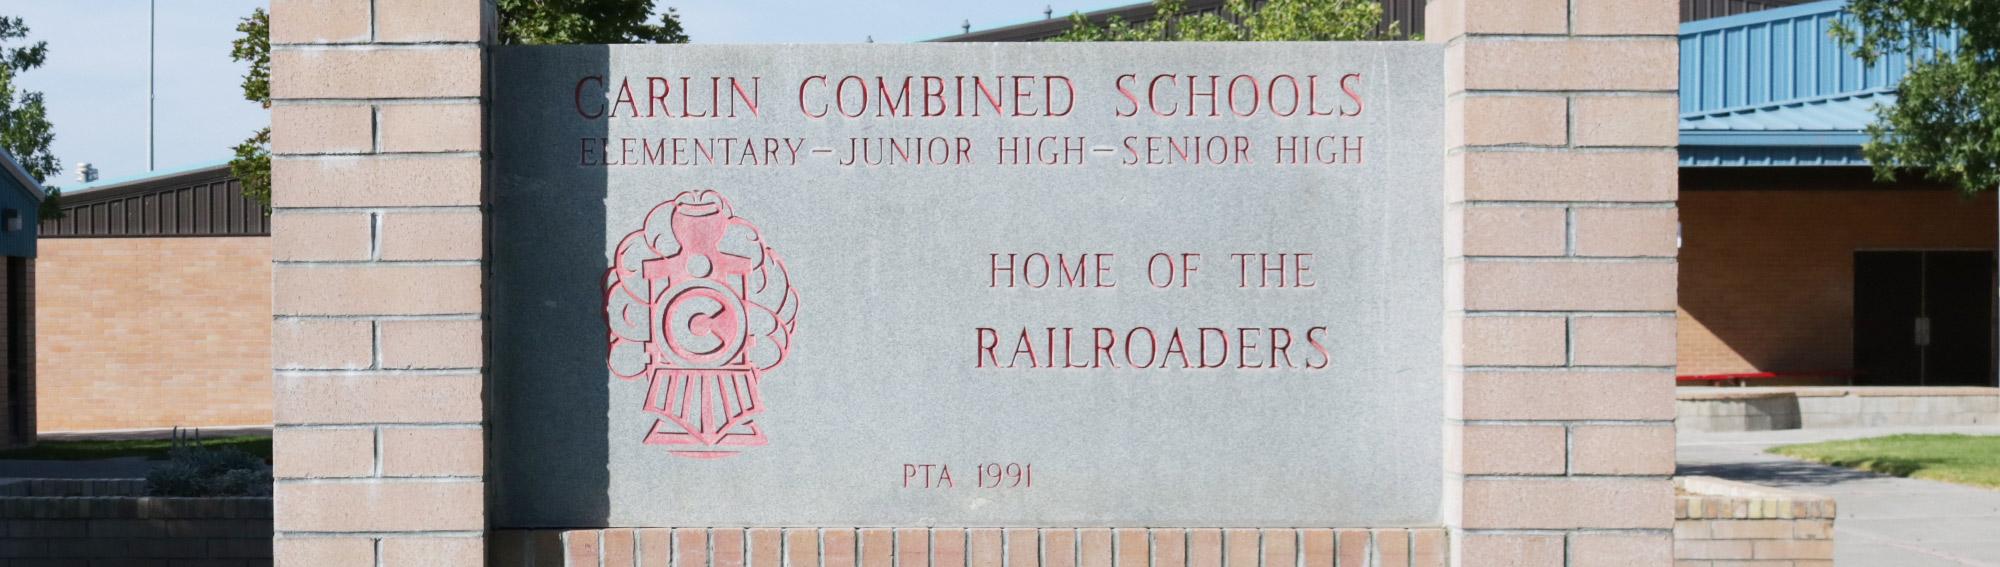 Carlin school sign